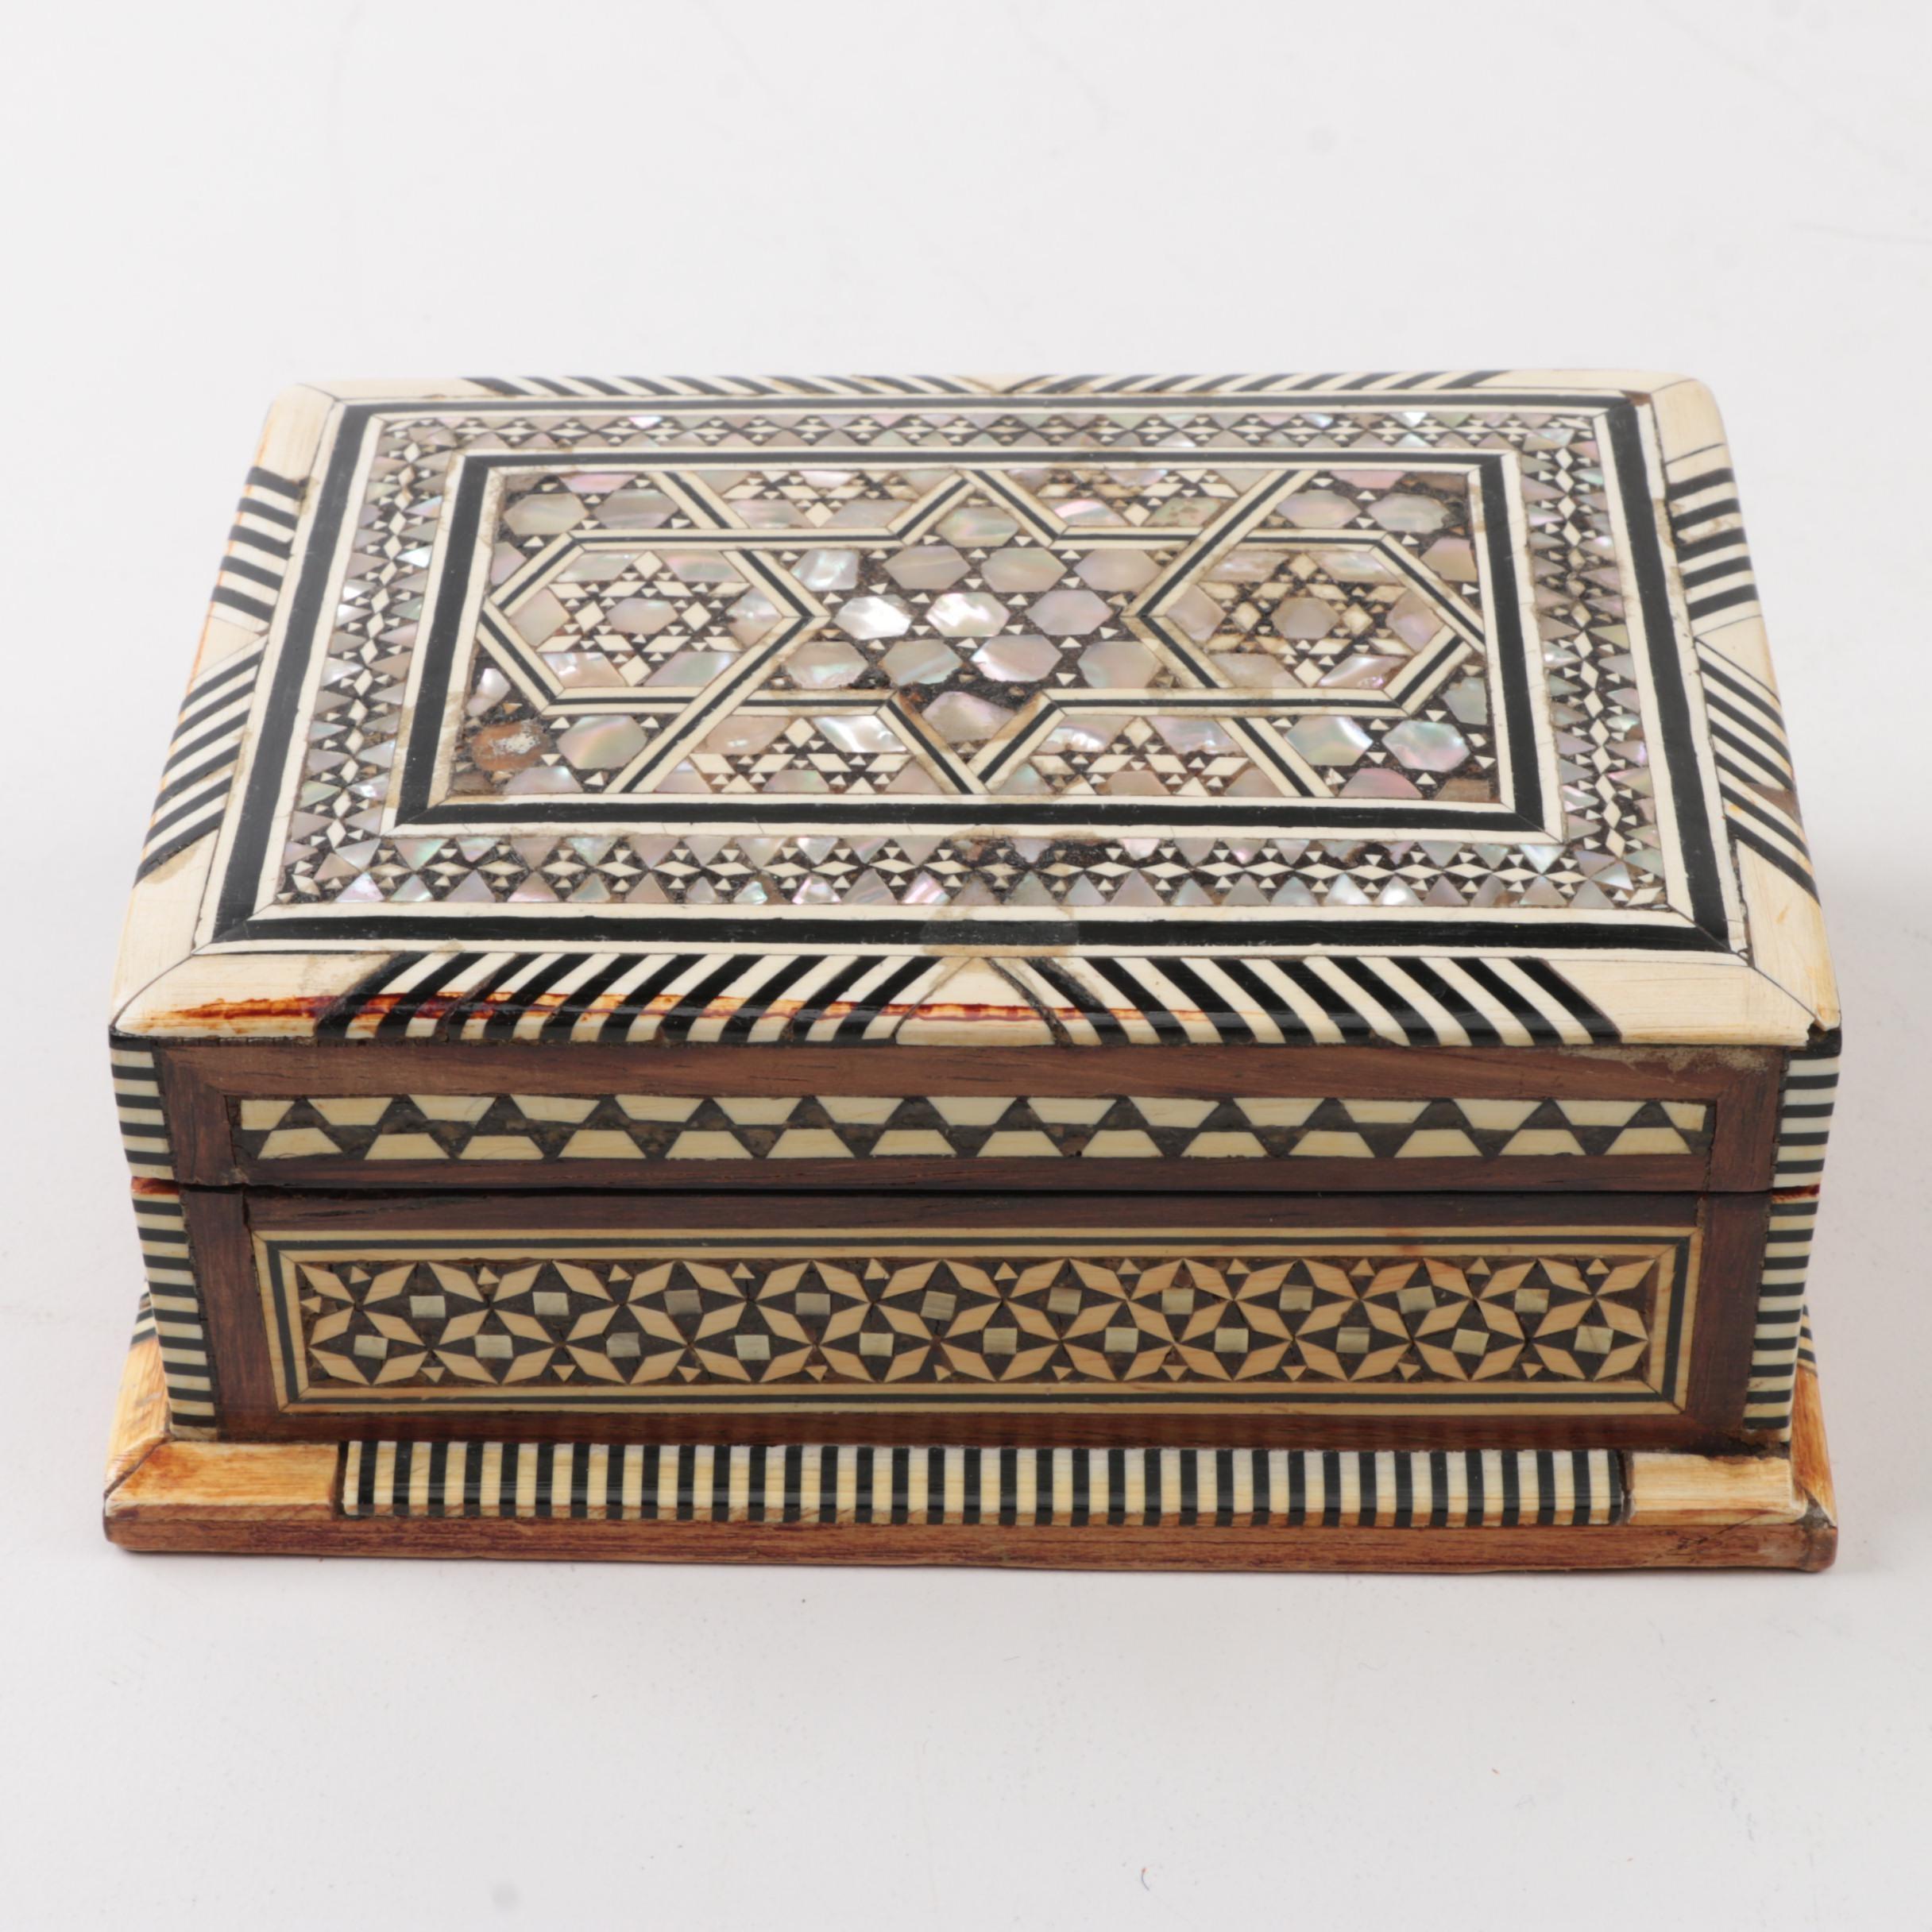 Mother of Pearl Khatam Trinket Box